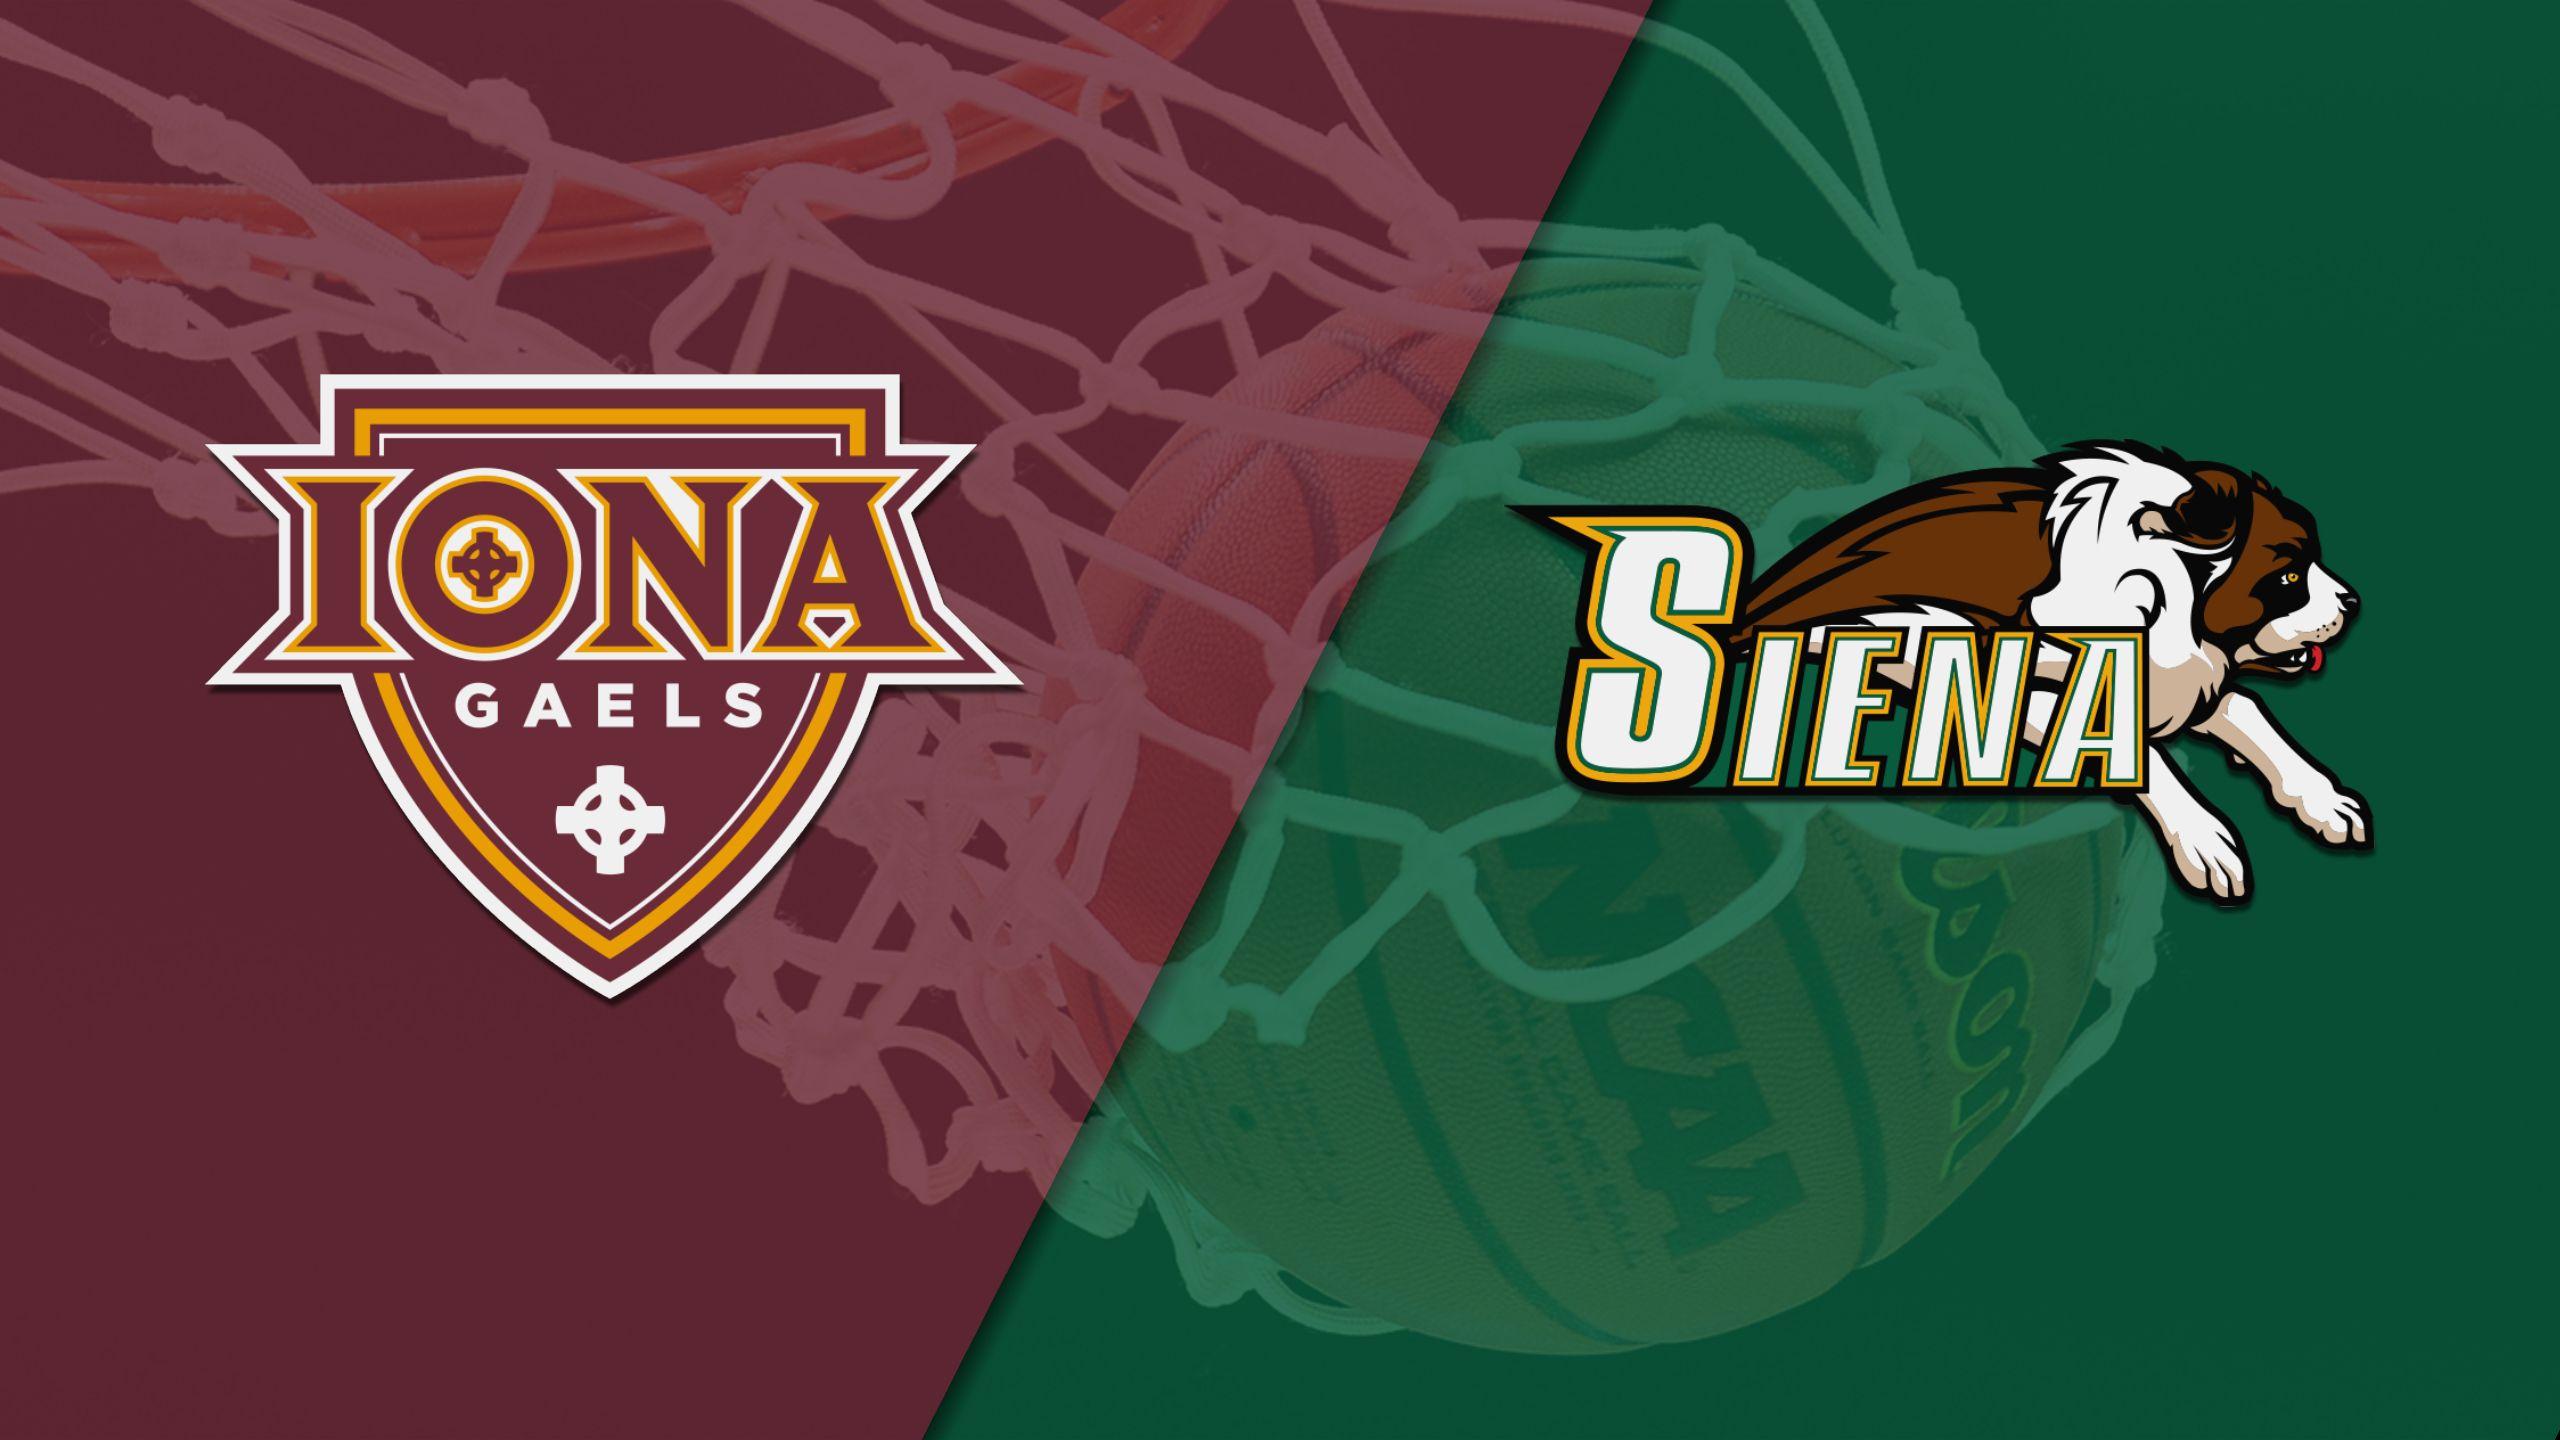 Iona vs. Siena (W Basketball)